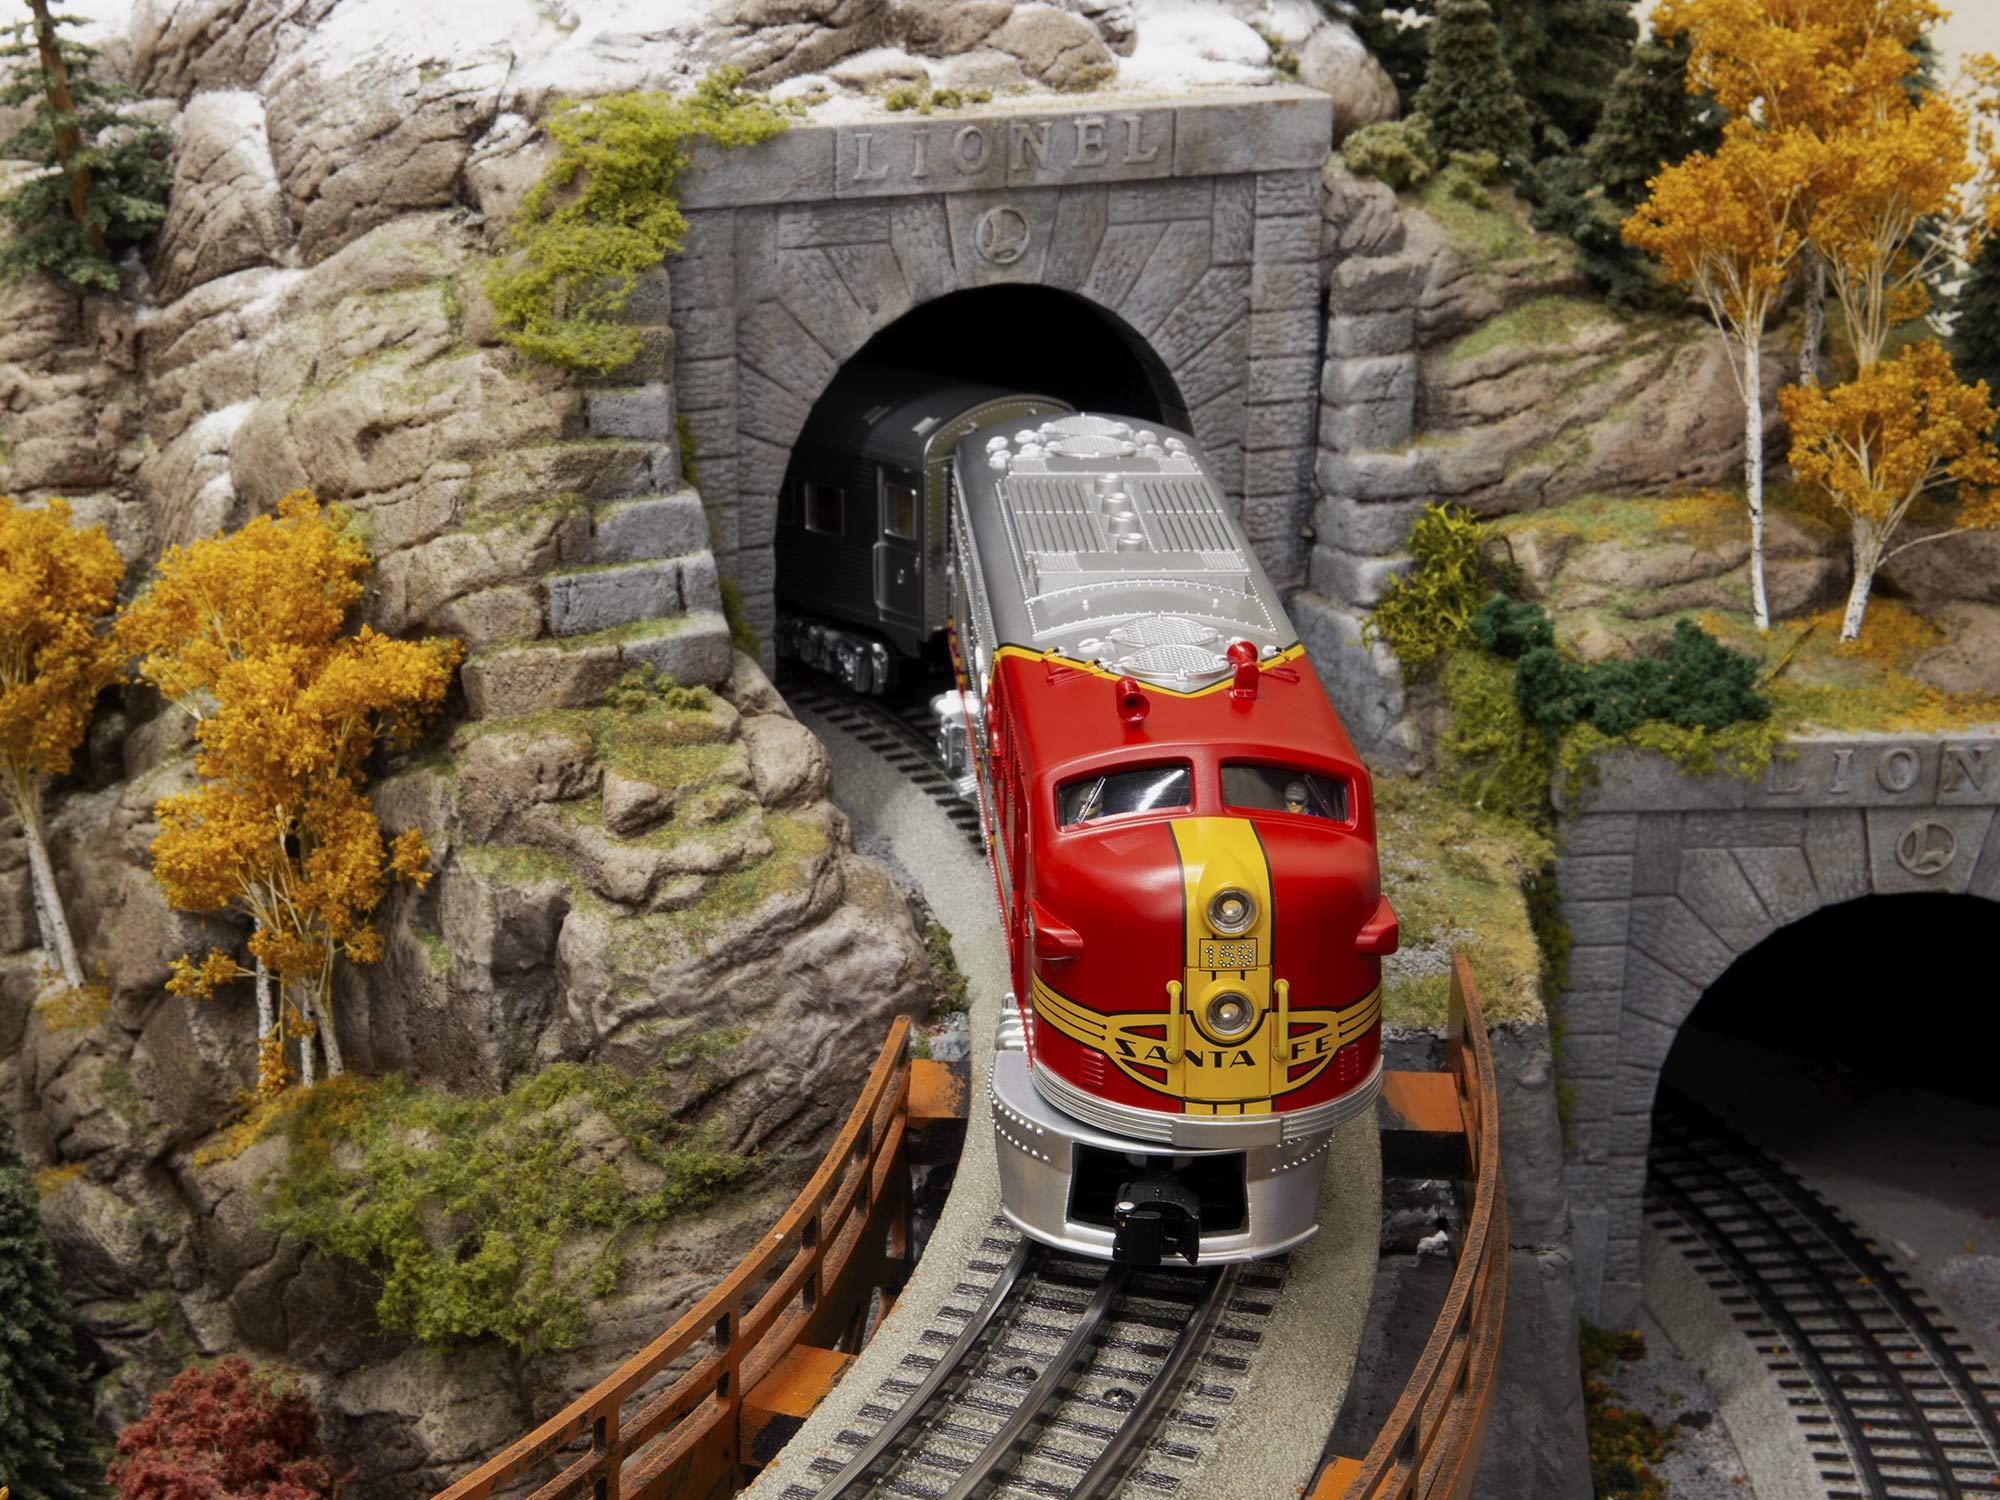 Lionel Santa Fe Super Chief Electric O Gauge Model Train Set w/ Remote and Bluetooth Capability by Lionel (Image #4)